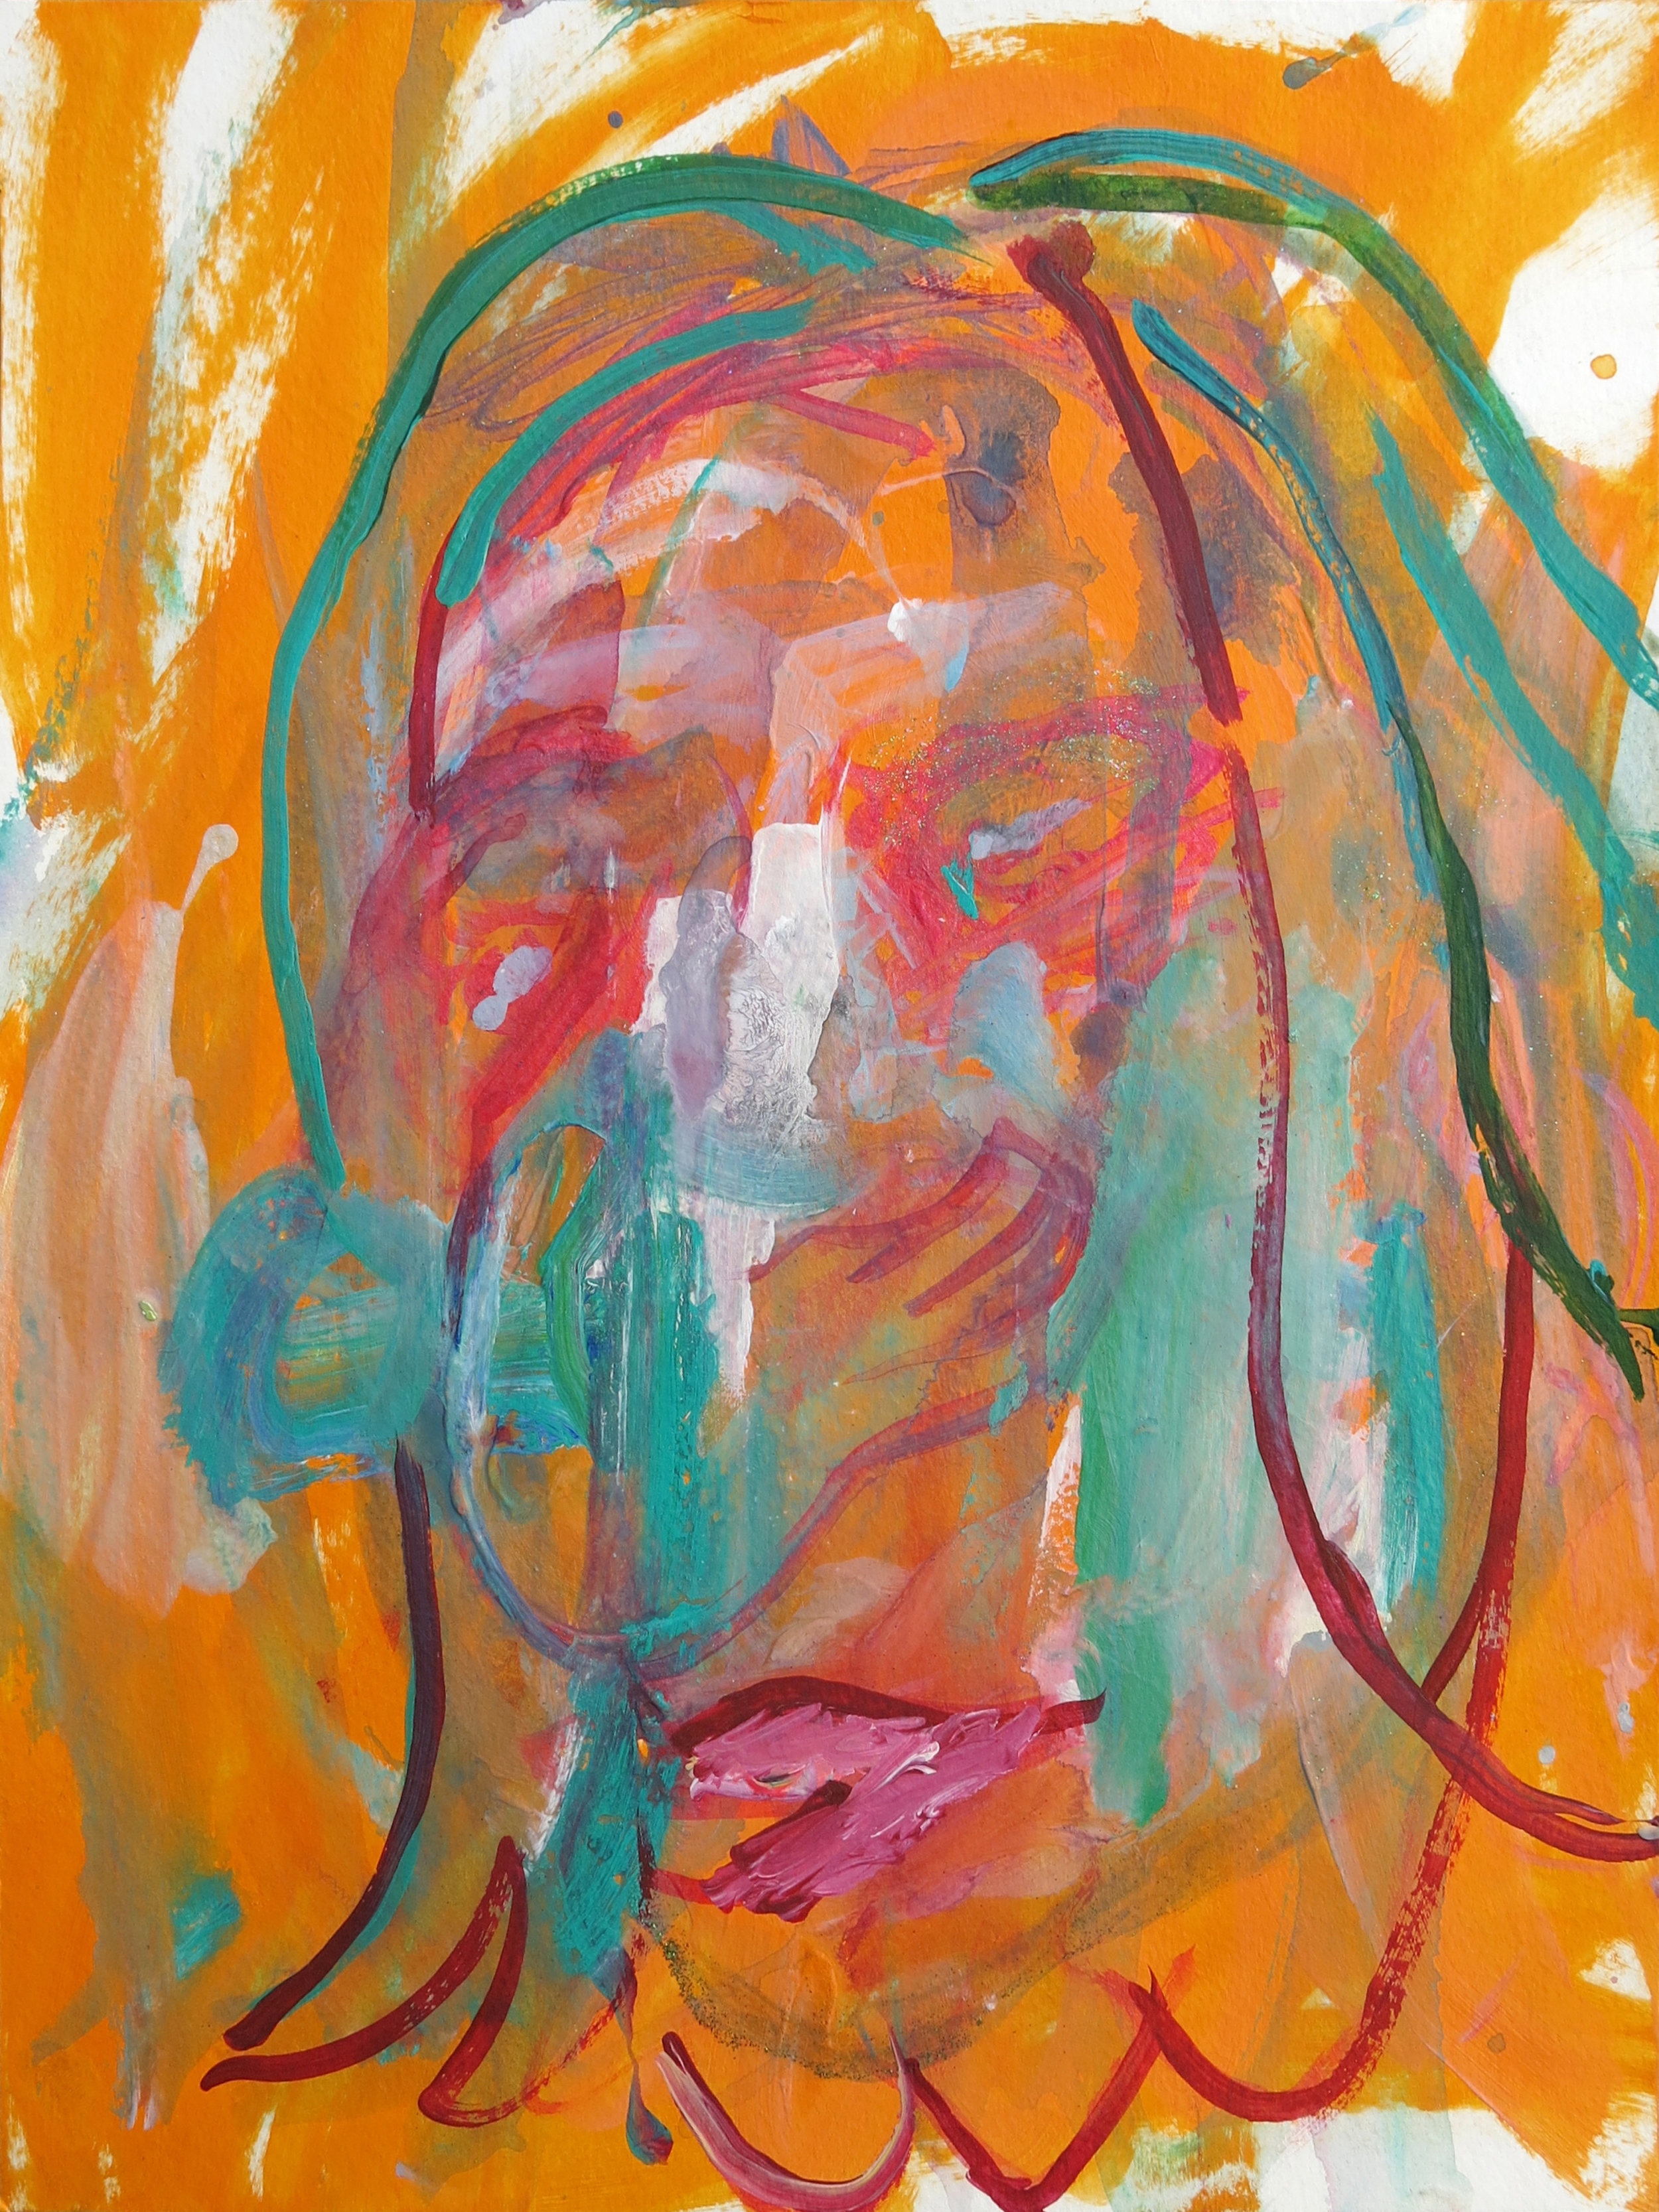 Barbra Streisand Portrait #199